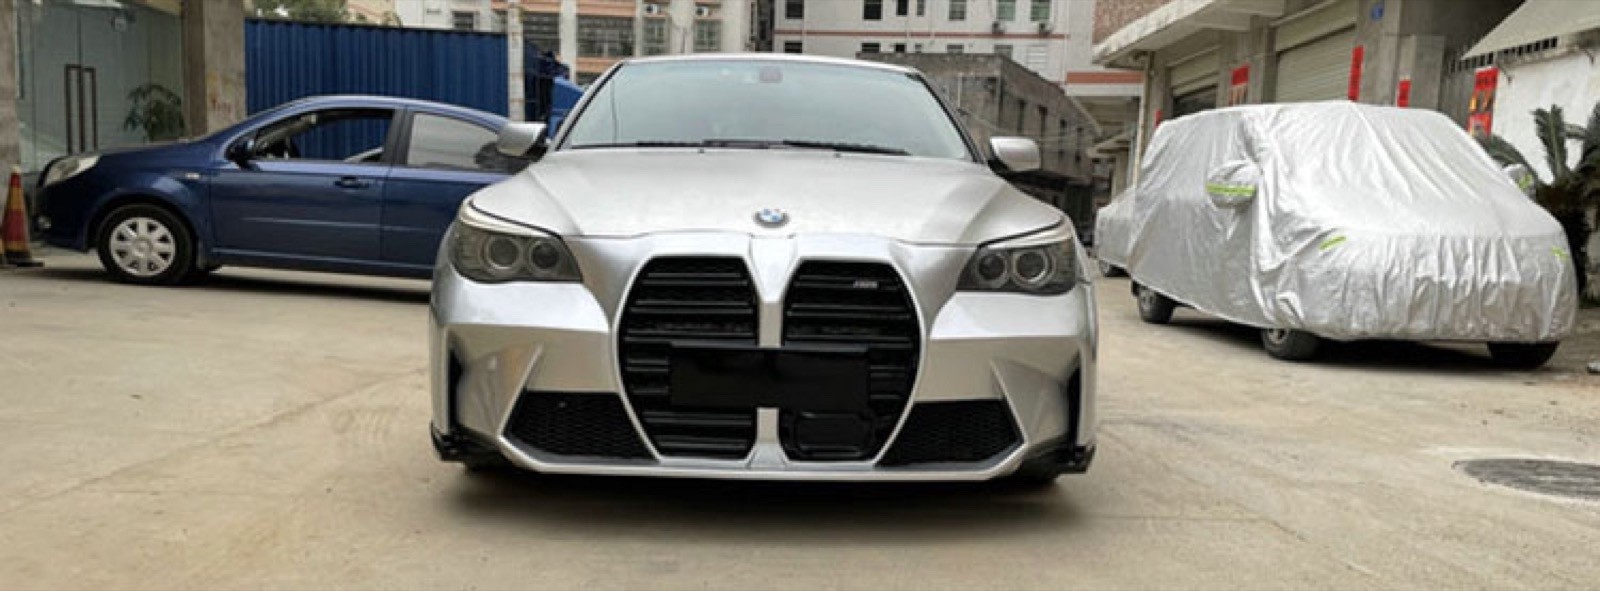 BMW_E60_grille-0001